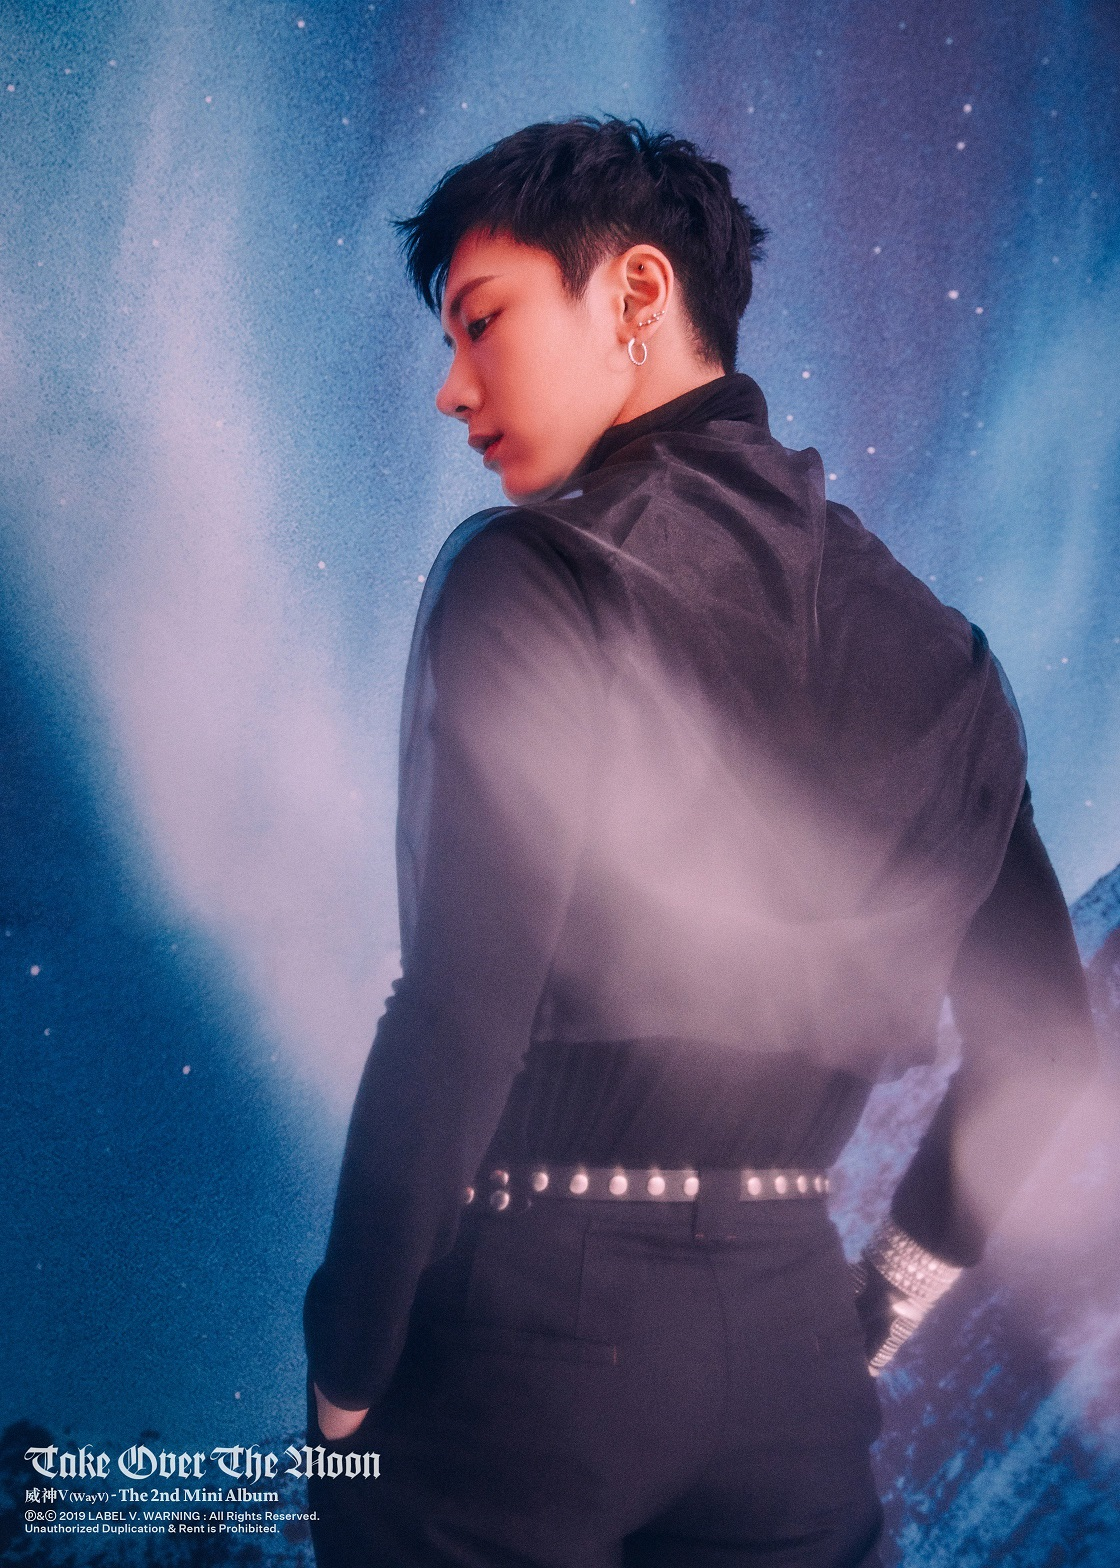 [Teaser Image_TEN] WayV - The 2nd Mini Album 'Take Over The Moon'